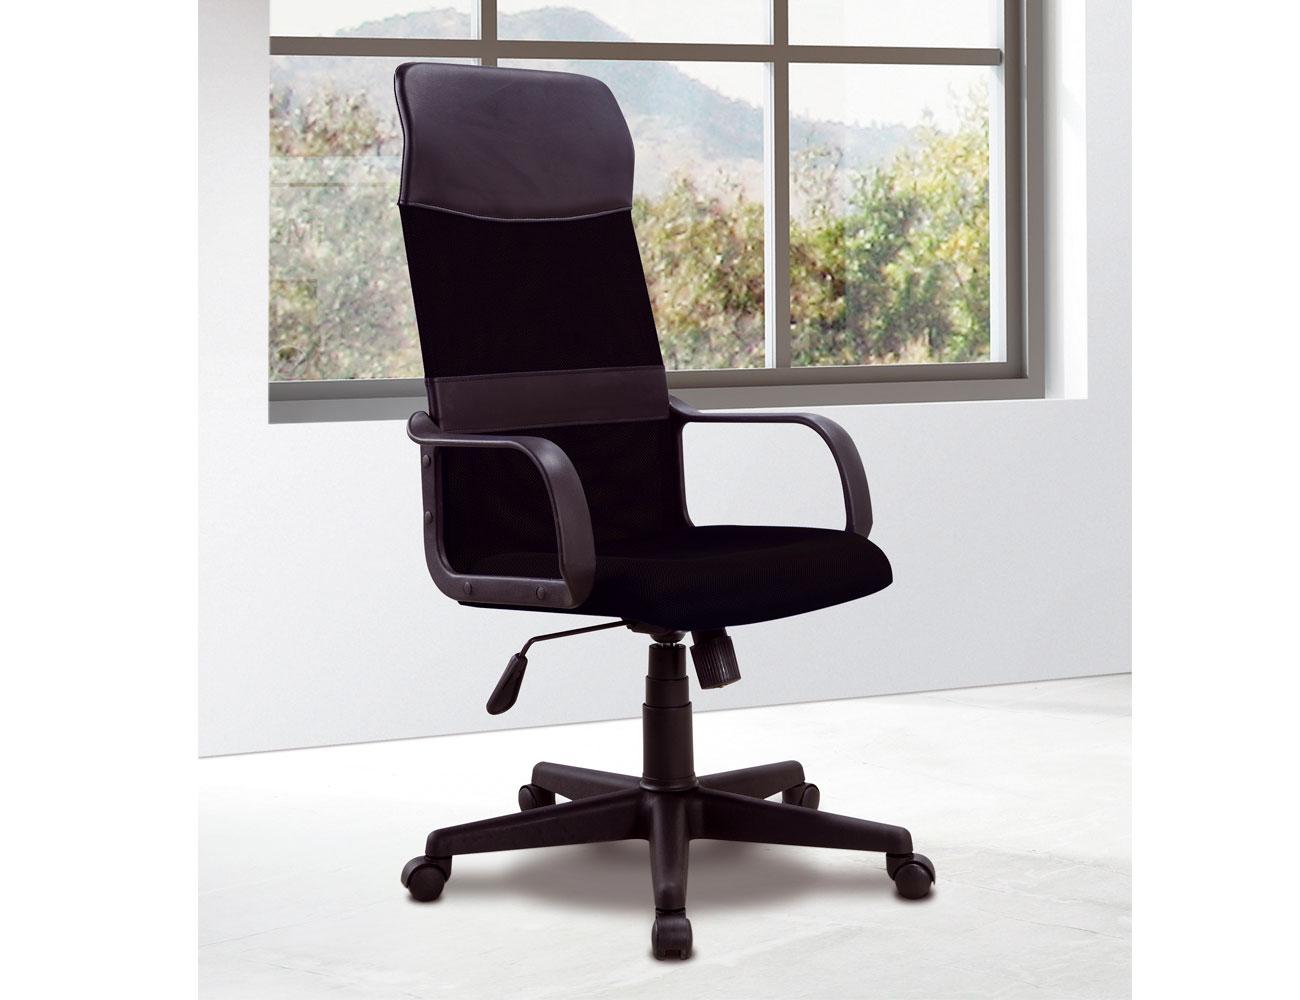 silla de oficina elevable con respaldo alto en color negro On respaldo silla oficina